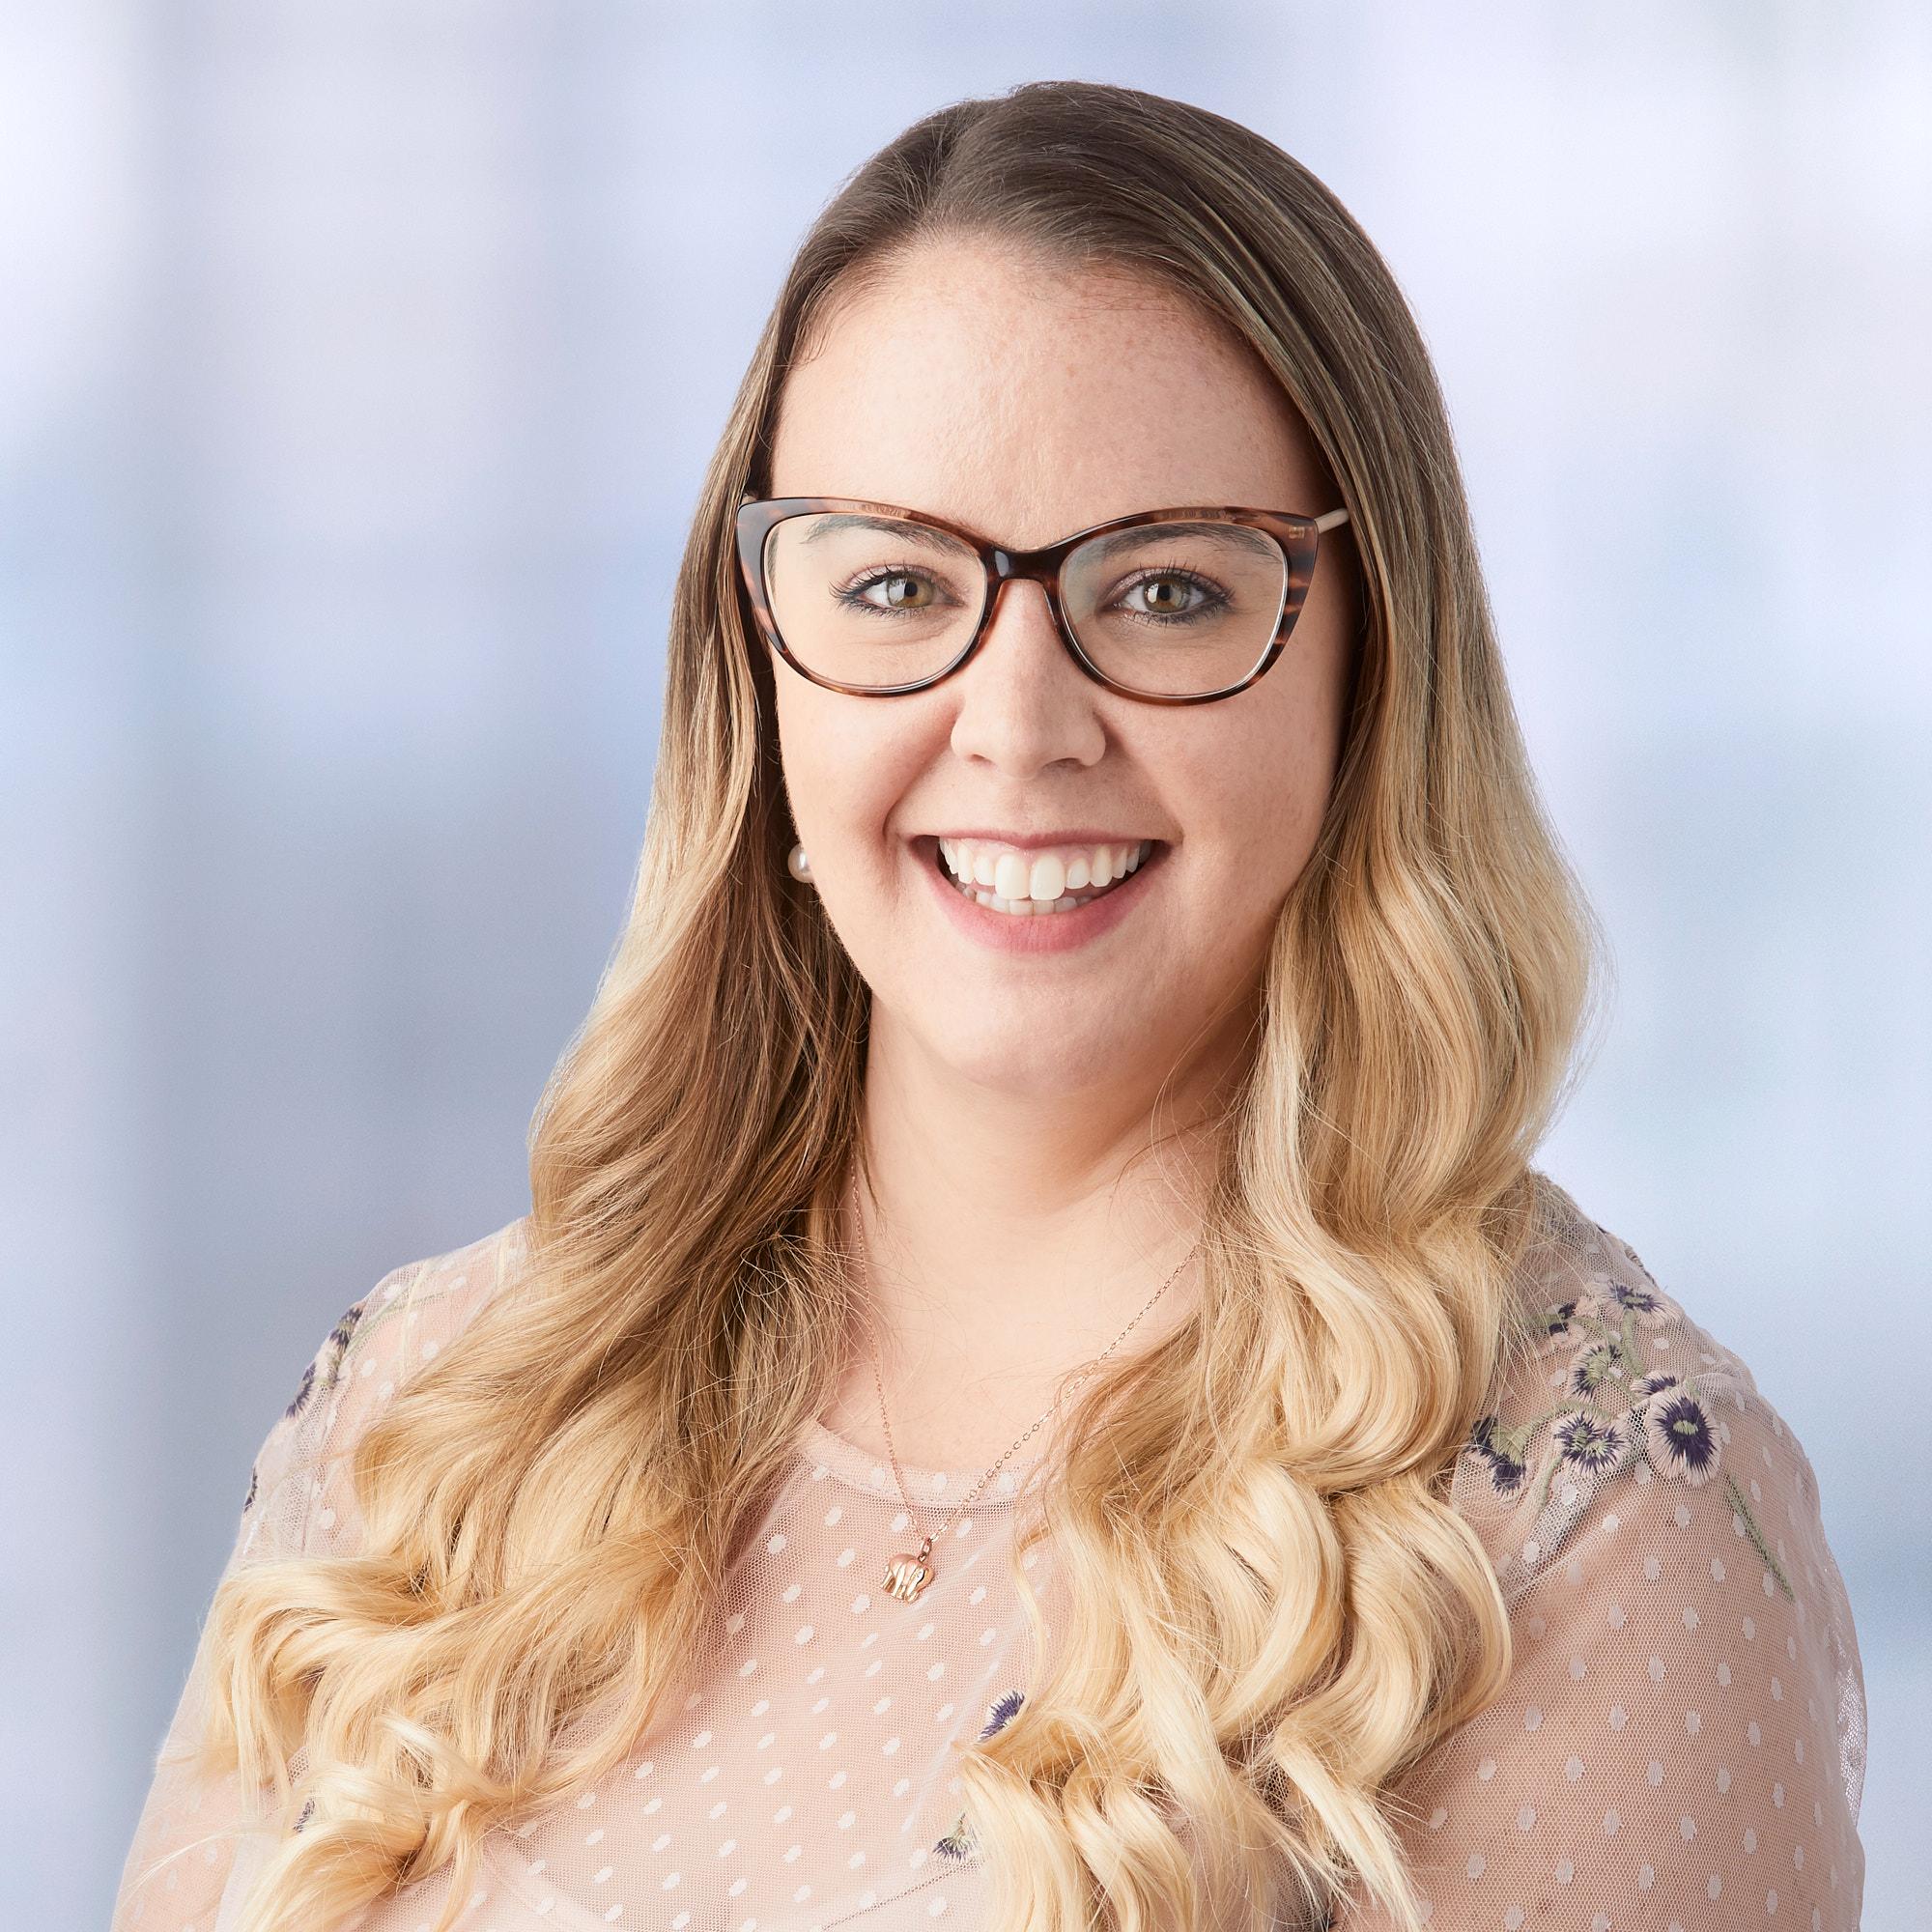 Johanna McFarland - Manager of Marketing & Communications